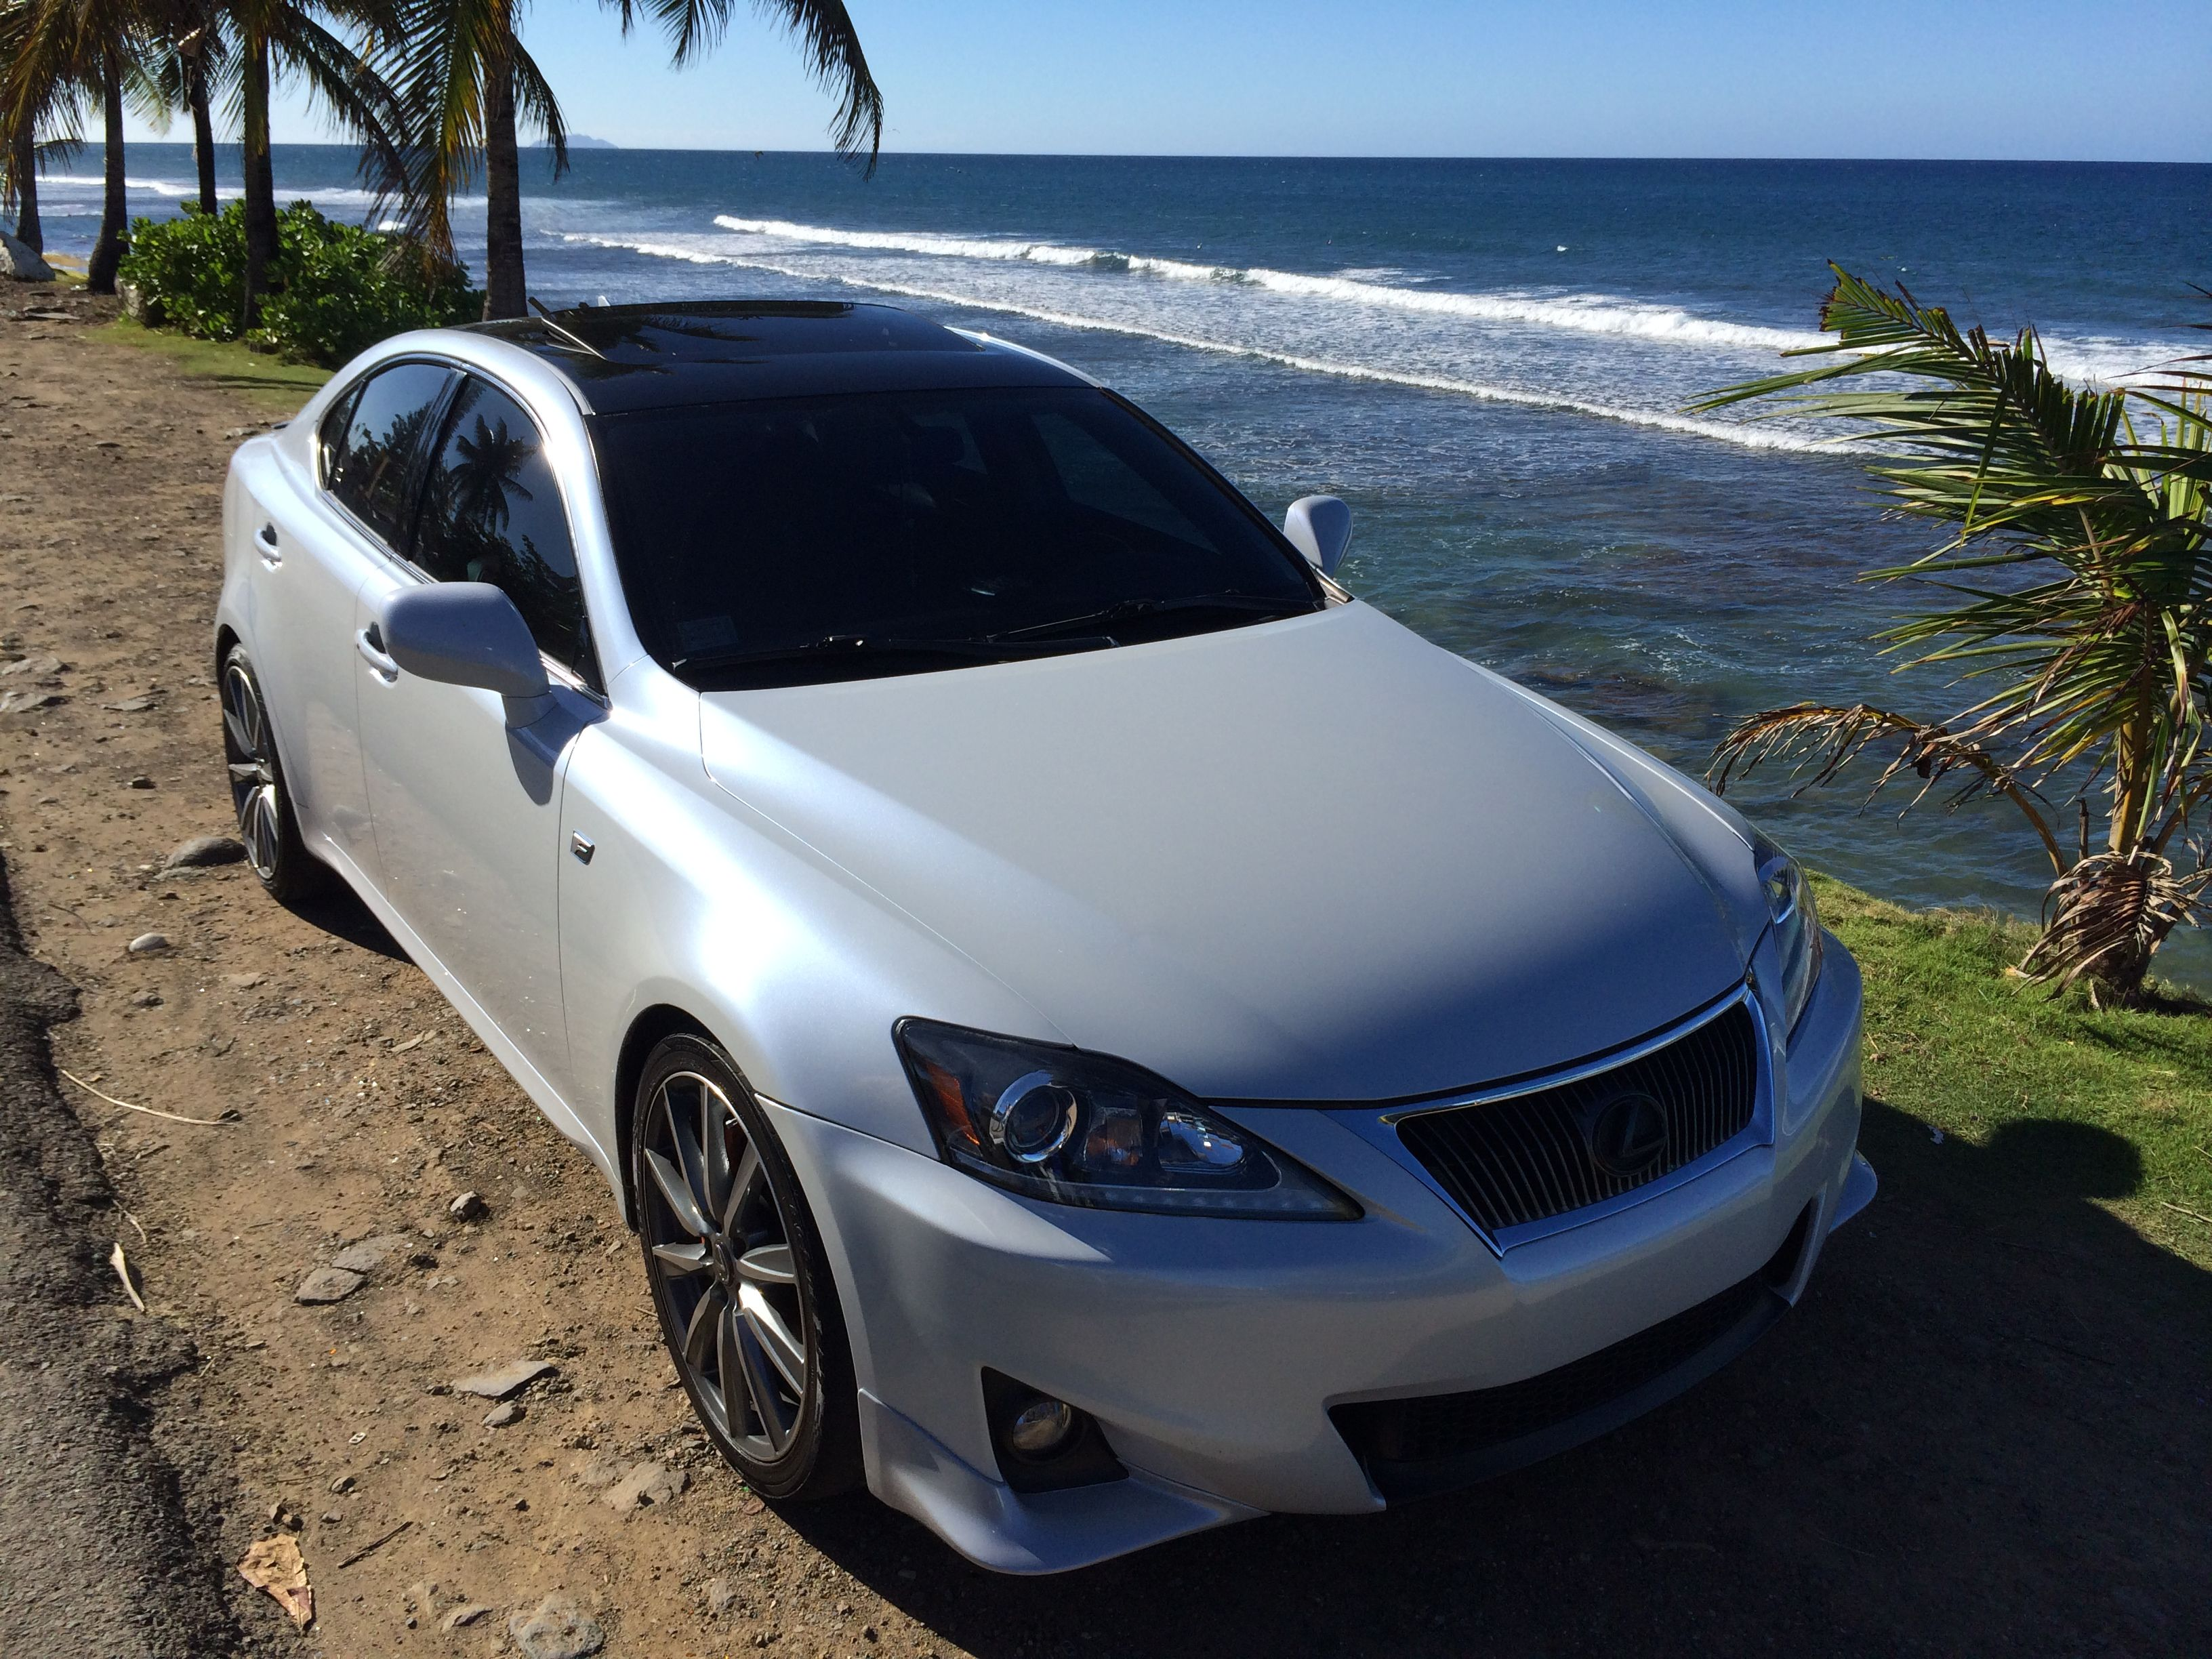 Lexus Is250 White Pearl. My First Lexus!! #lexus #is250 #cars #PuertoRico  #lexusboys #lexususa #lexuscar #lexusFpr